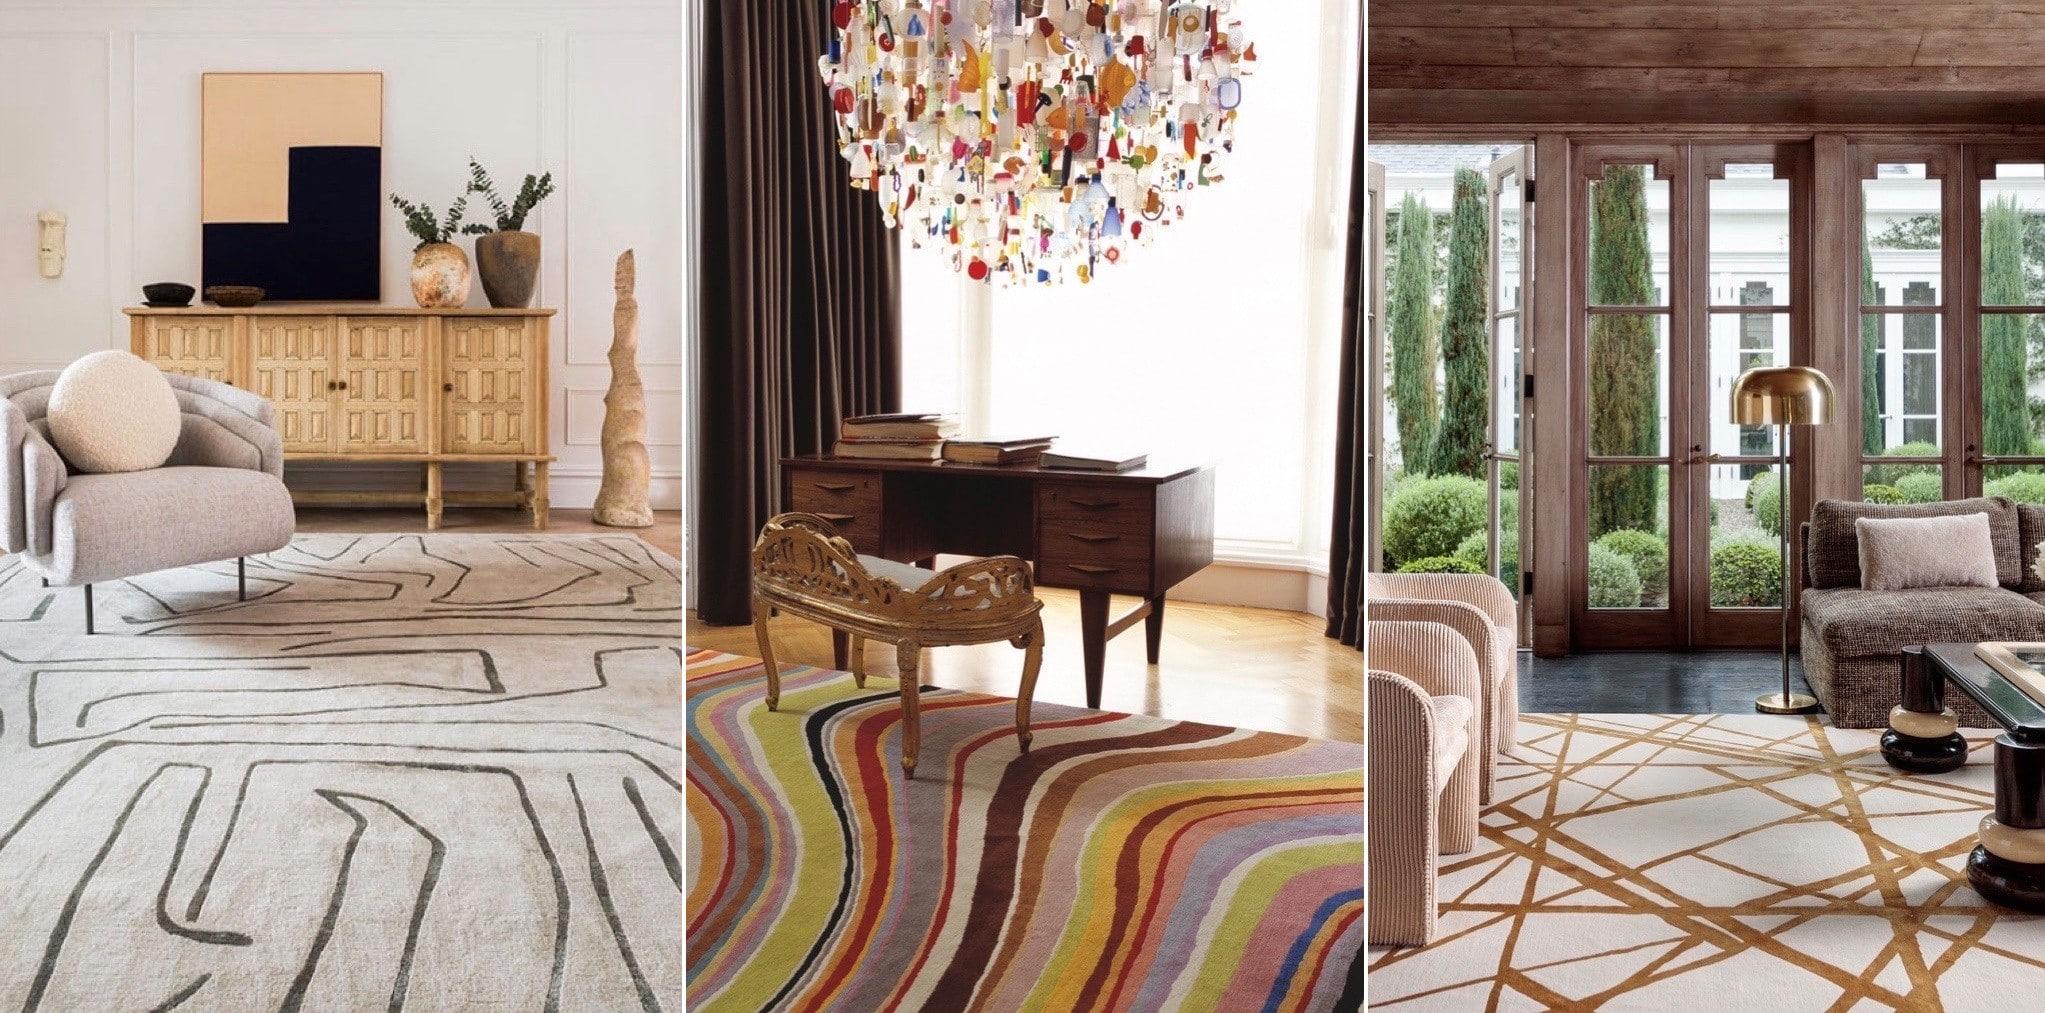 3 exemples de tapis moderne haut de gamme Luxembourg